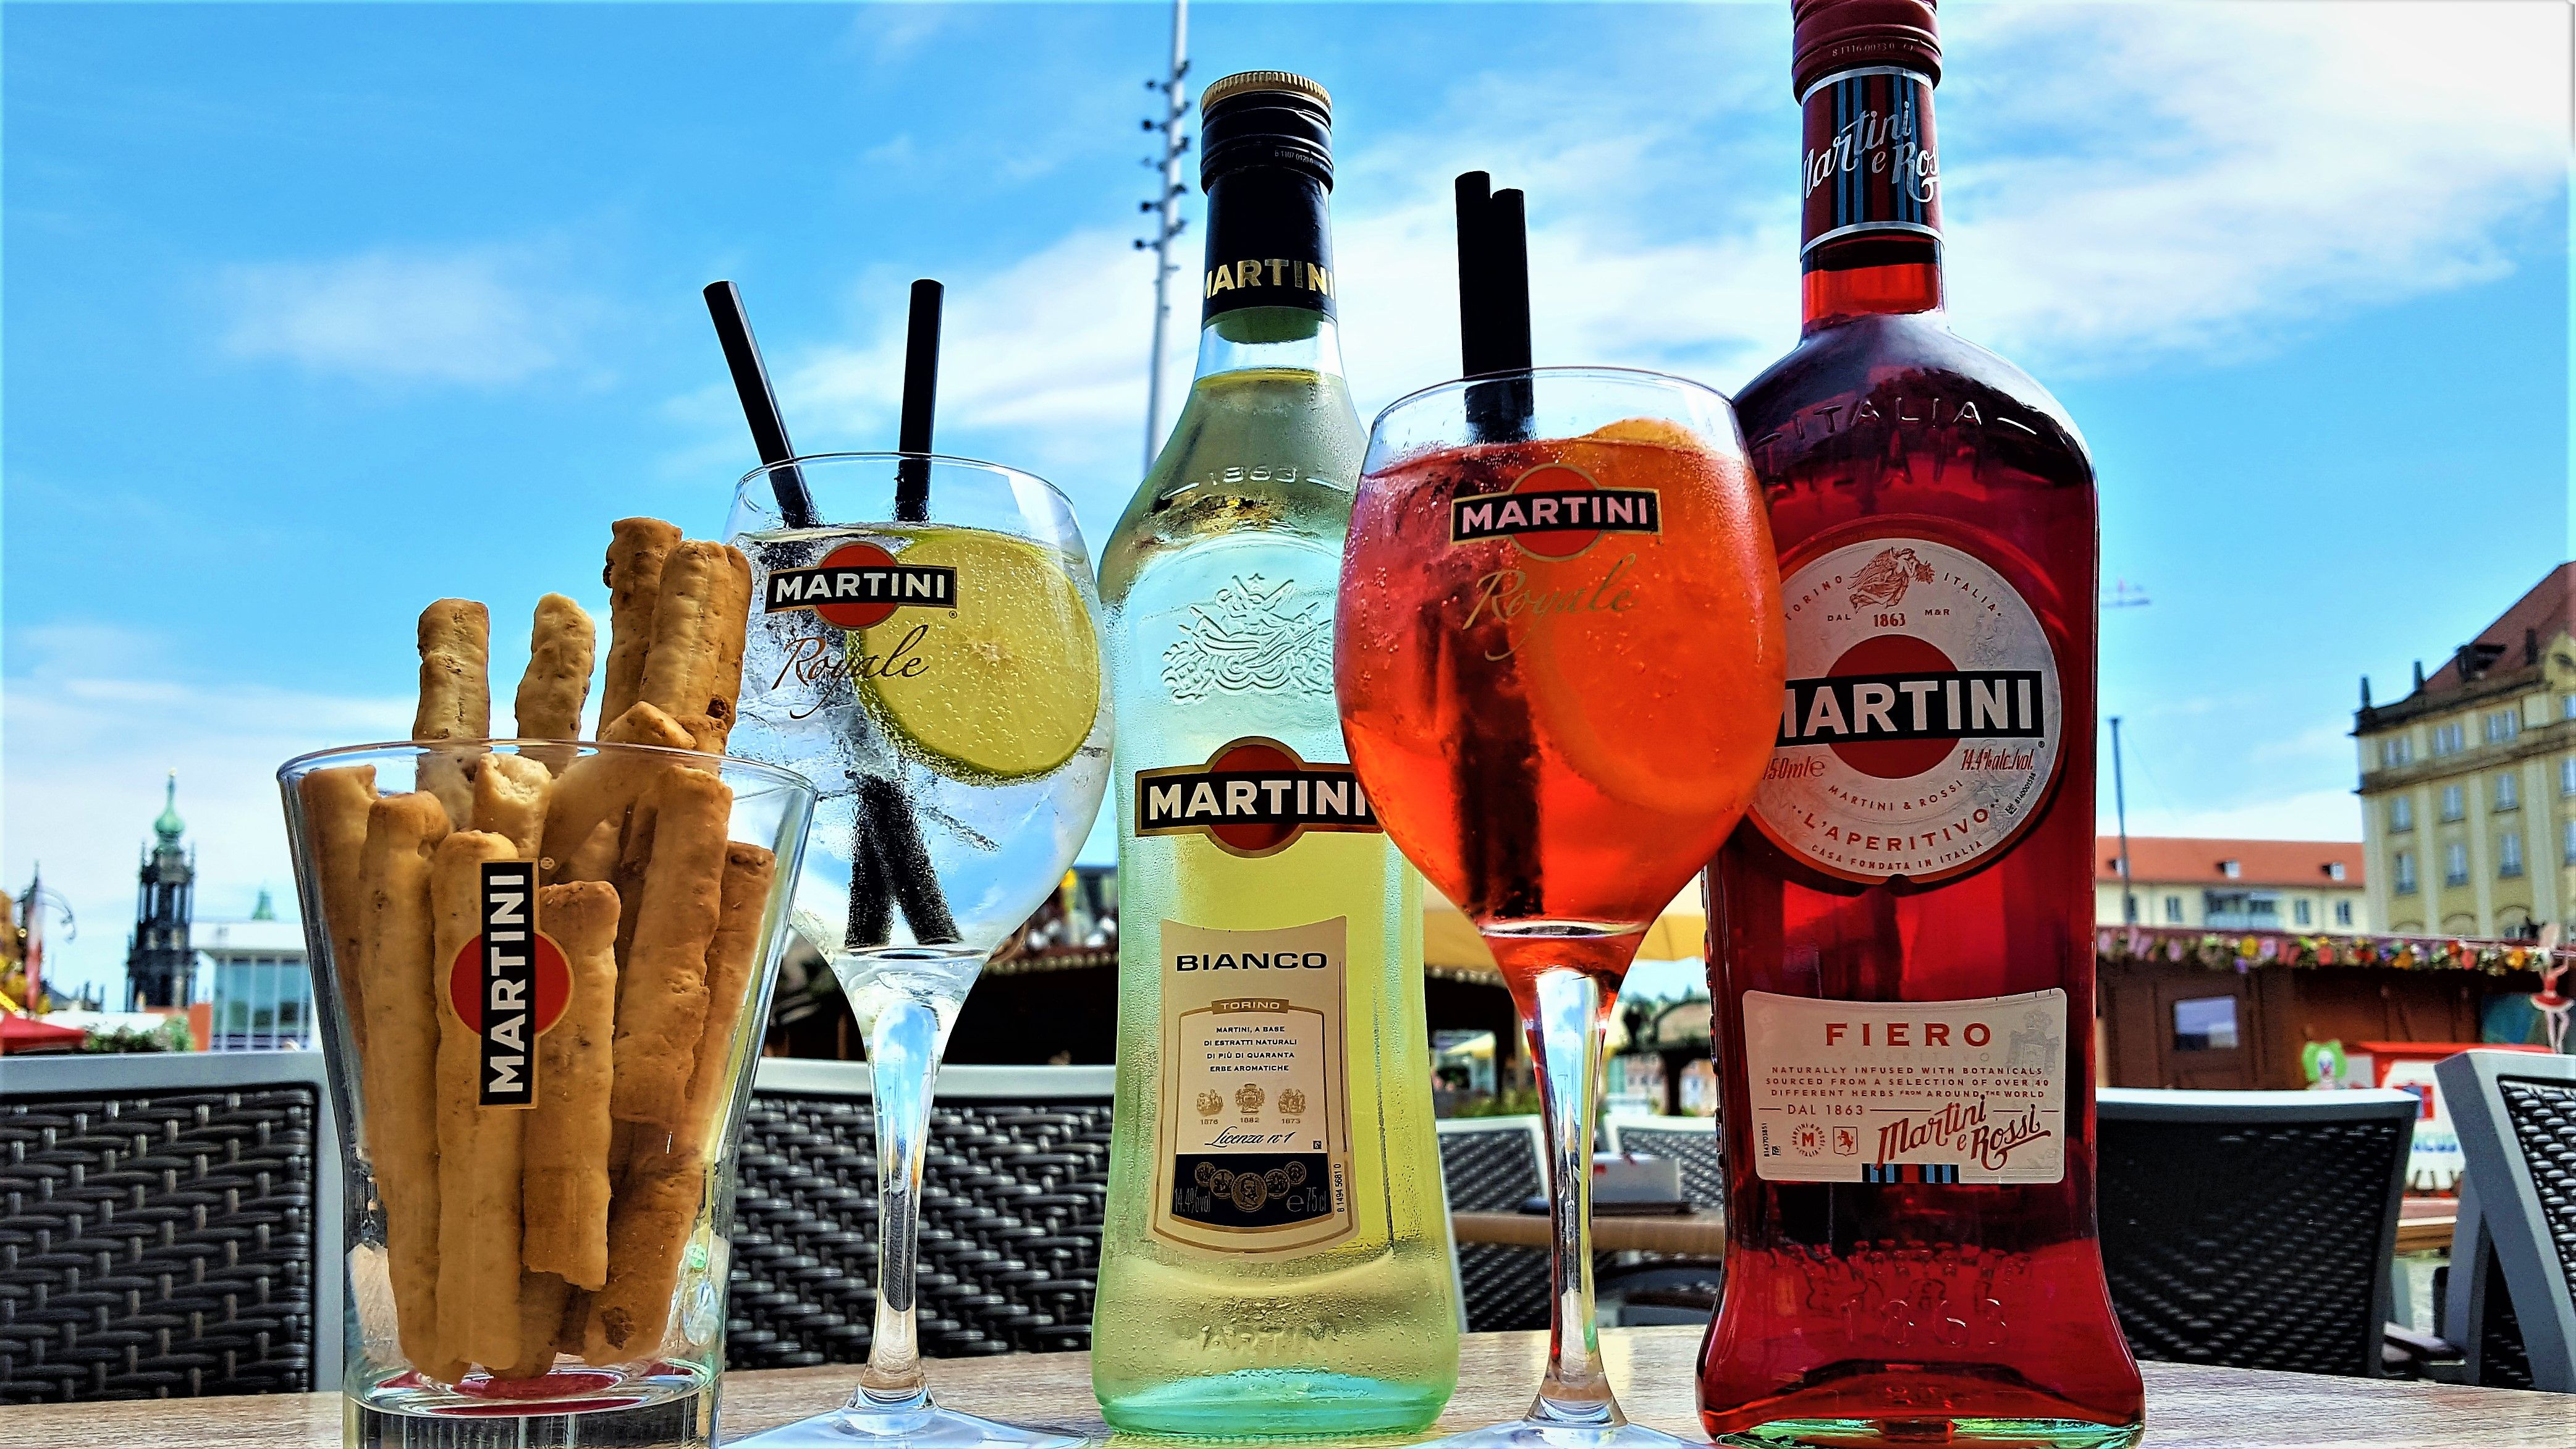 Martini Fiero mit Tonic